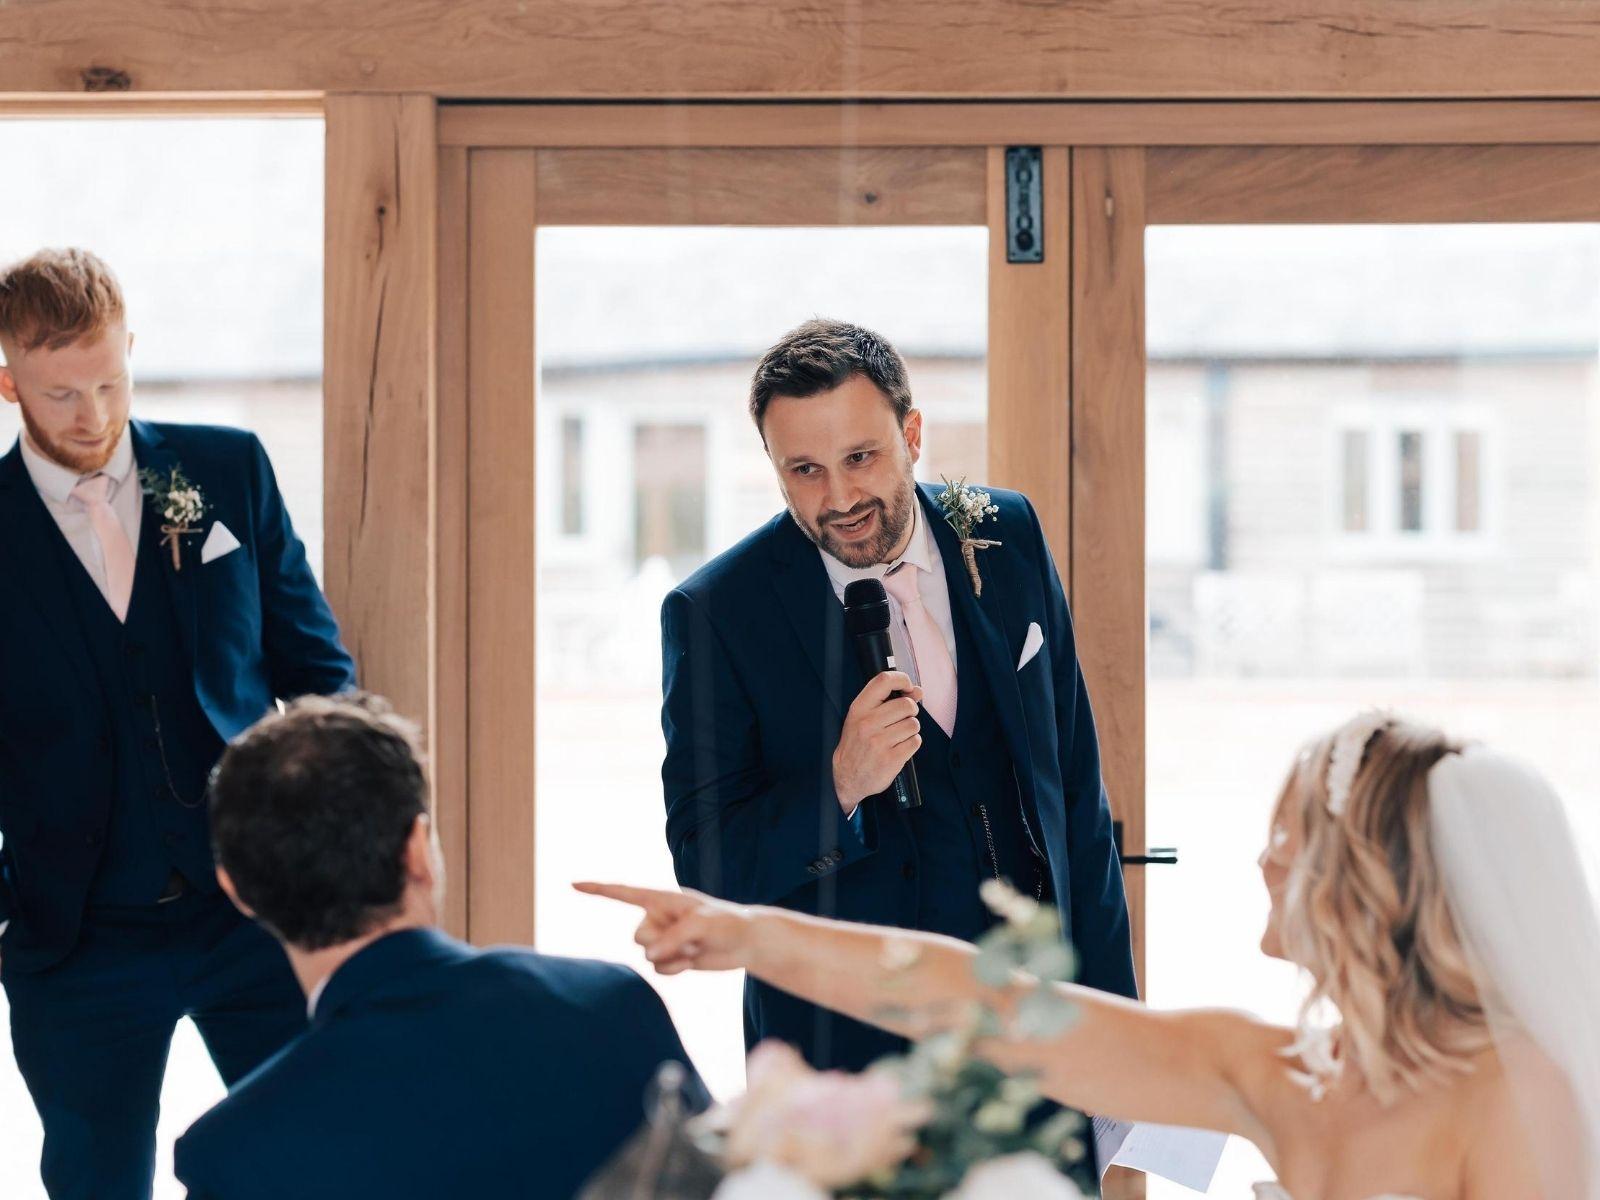 Funny wedding speeches at Boho Bride wedding